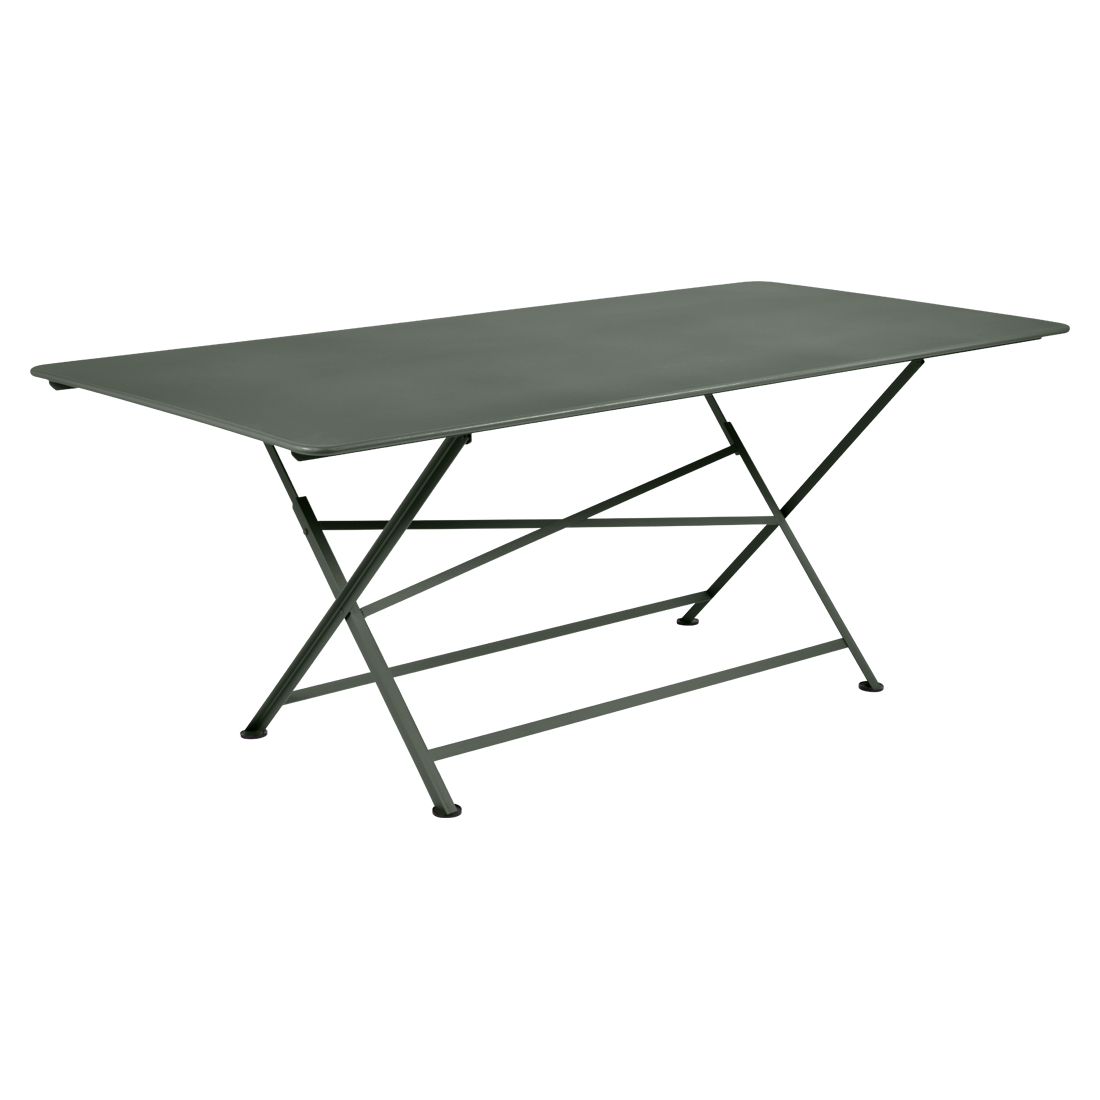 table de jardin, table metal, table de jardin pliante, table metal pliante, table fermob vert